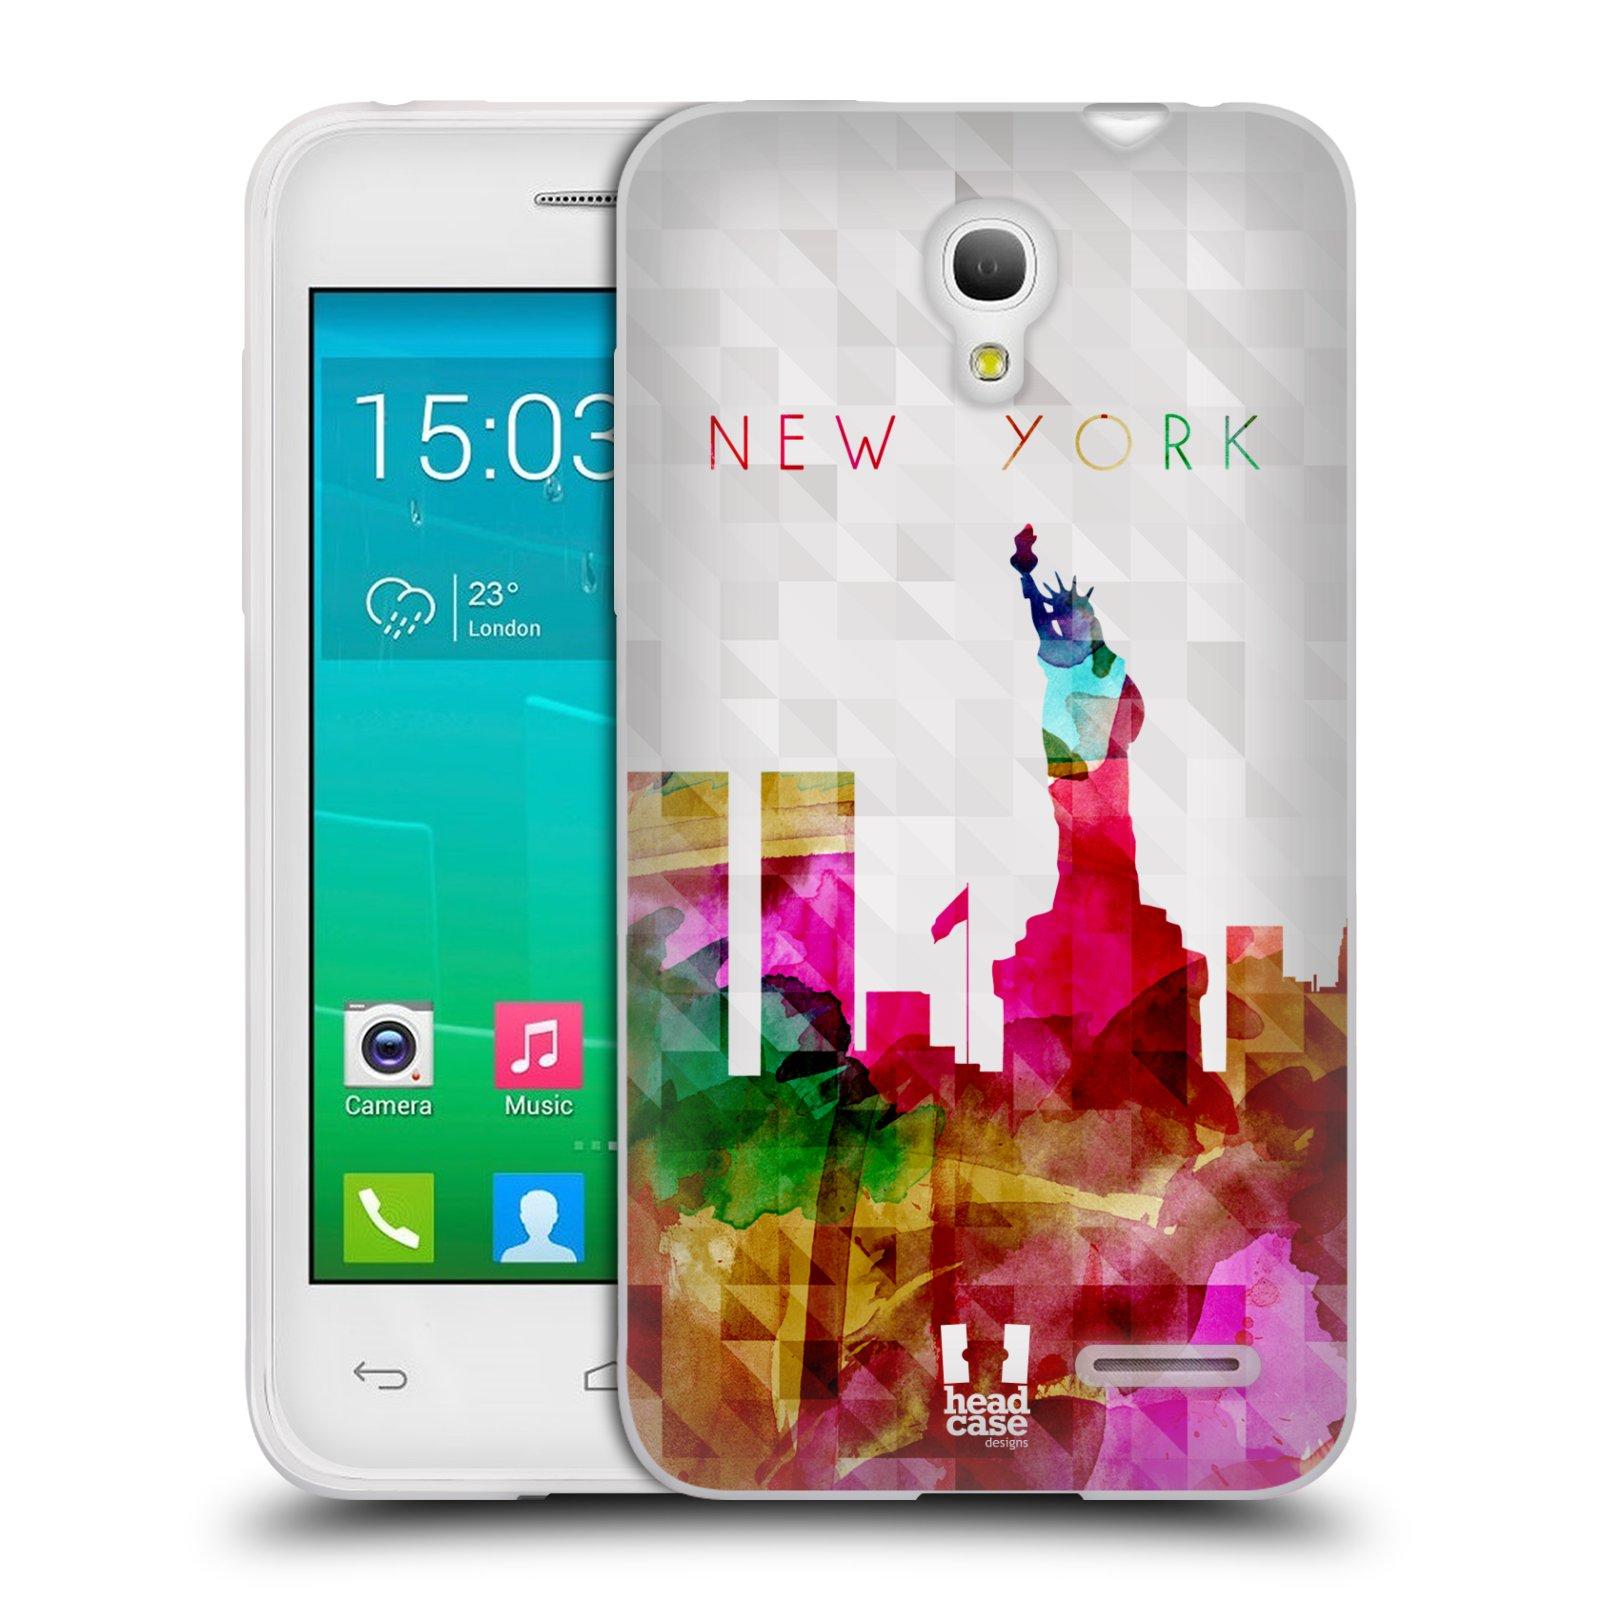 HEAD CASE silikonový obal na mobil Alcatel POP S3 OT-5050Y vzor Vodní barva města silueta NEW YORK USA SOCHA SVOBODY